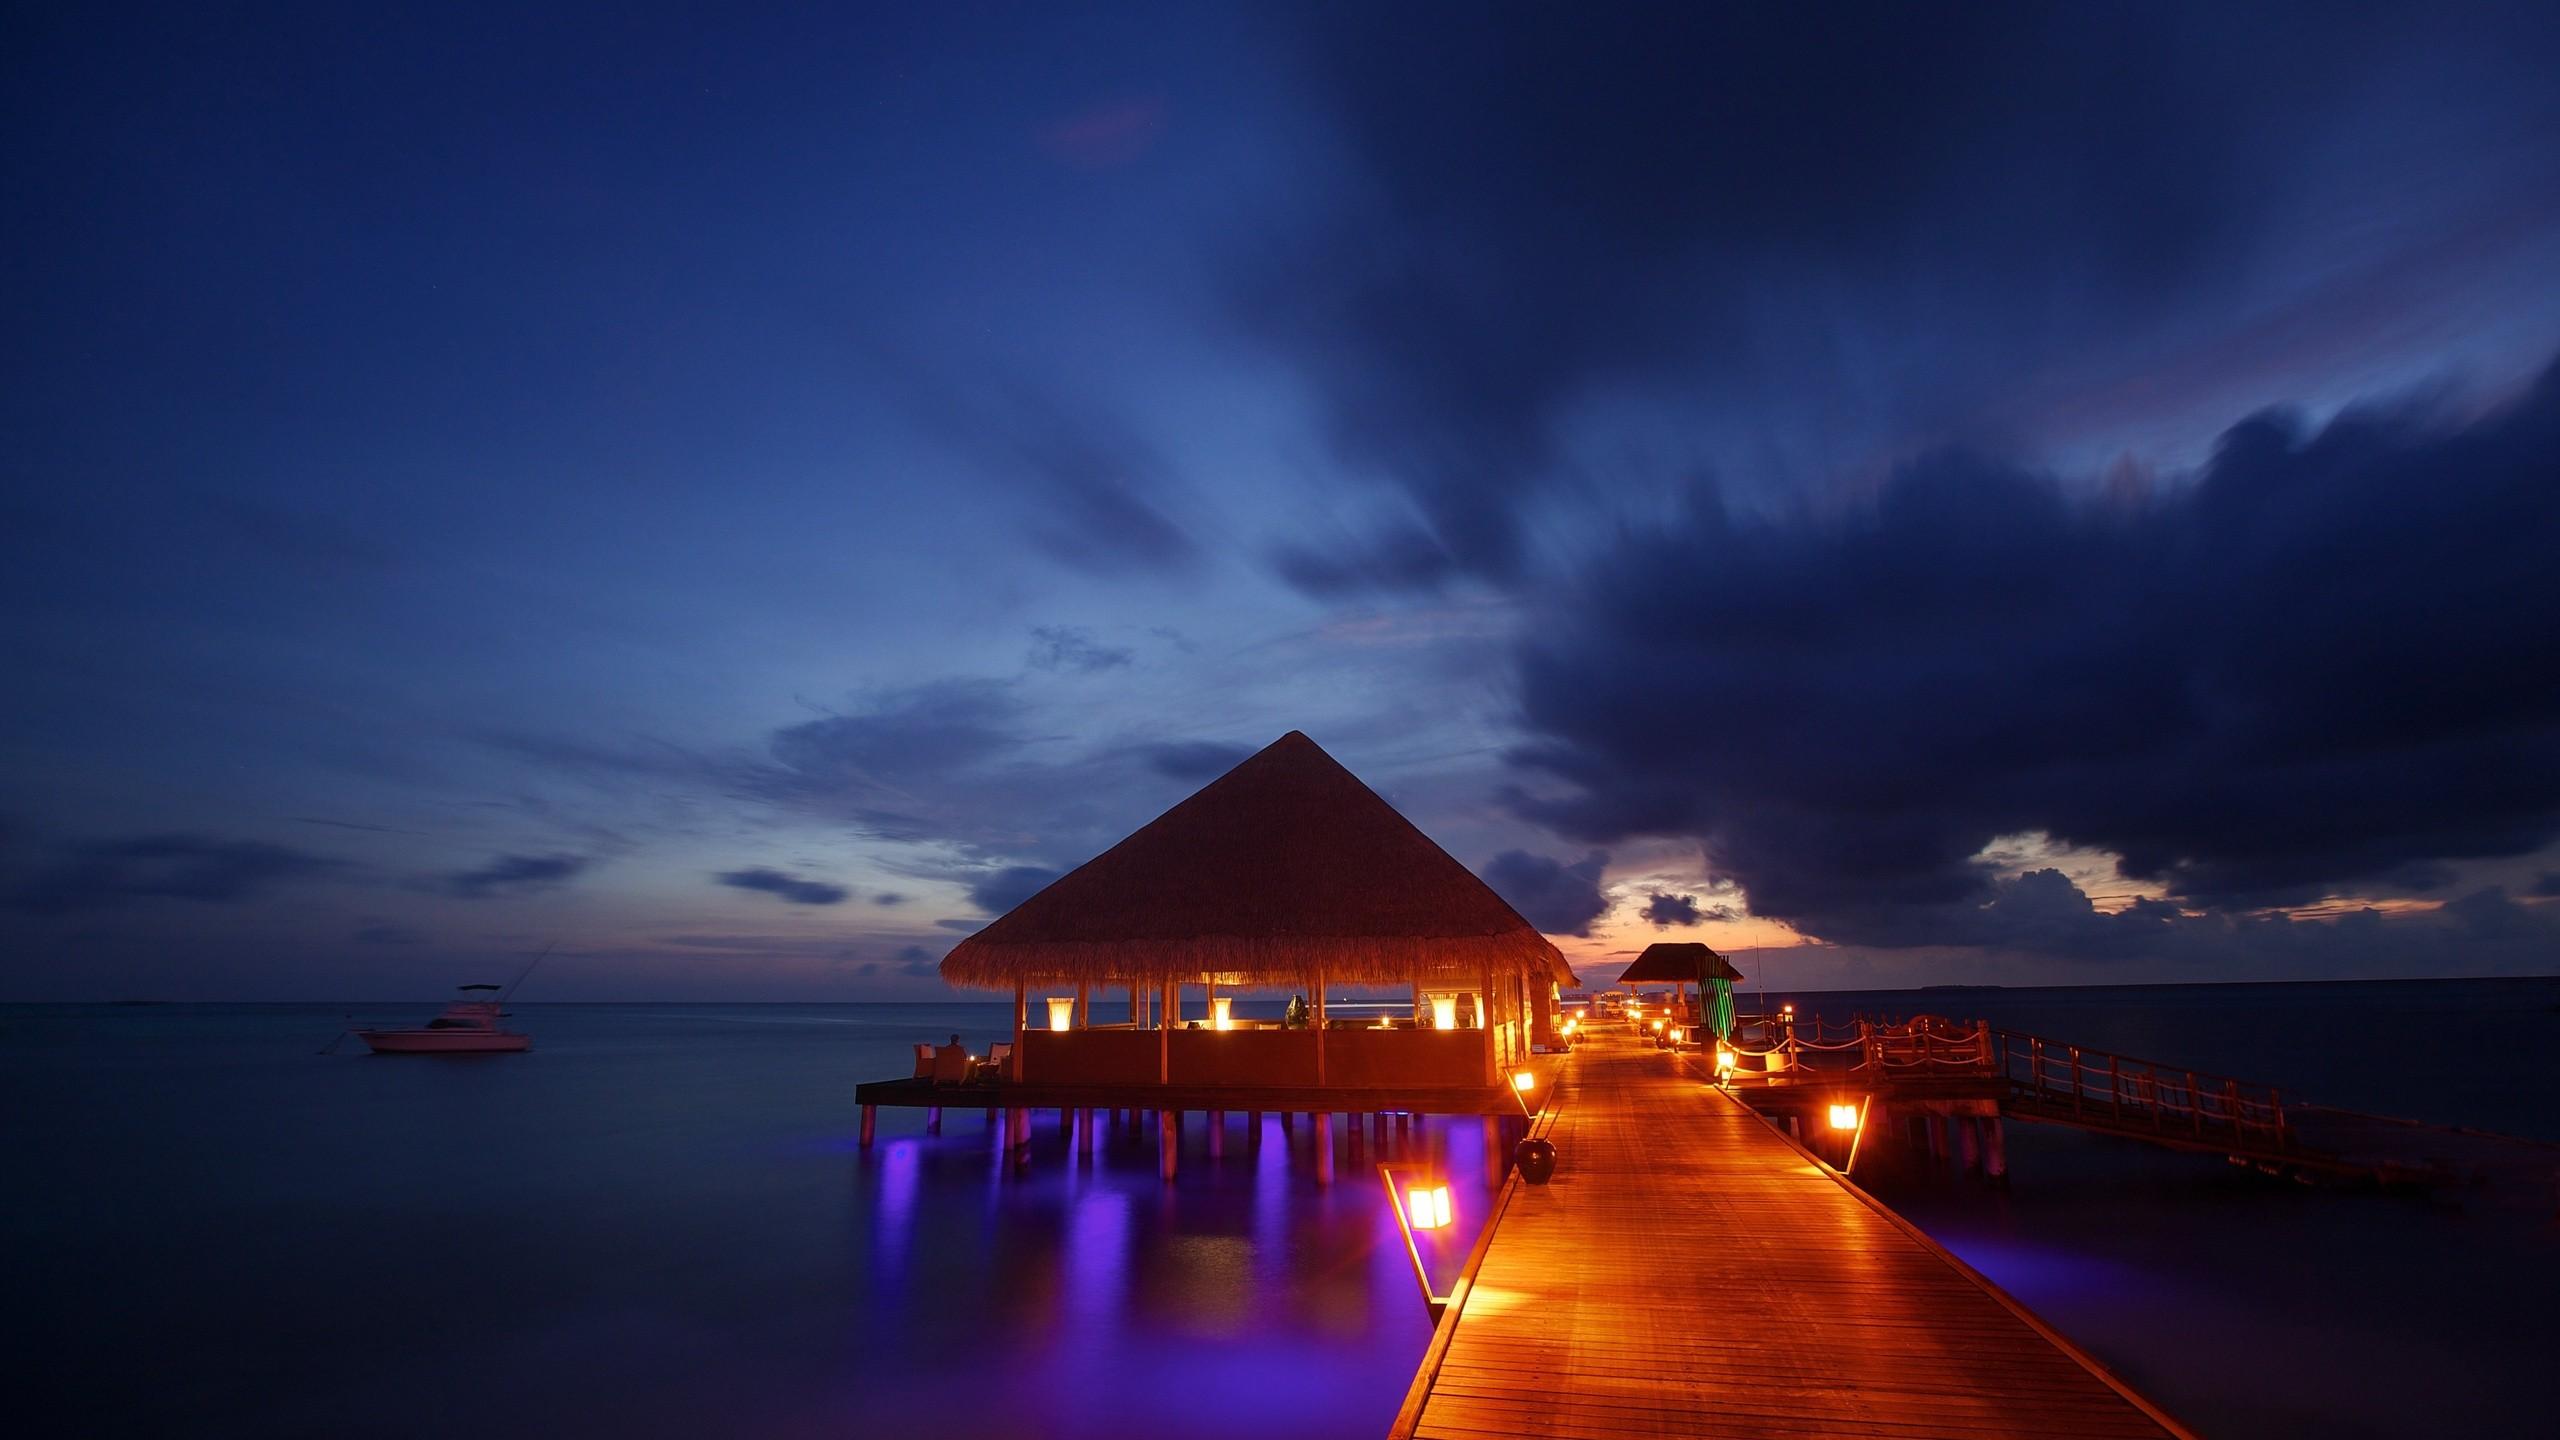 night lights Maldives tropical beach bungalow ocean sea sunset reflection  wallpaper background